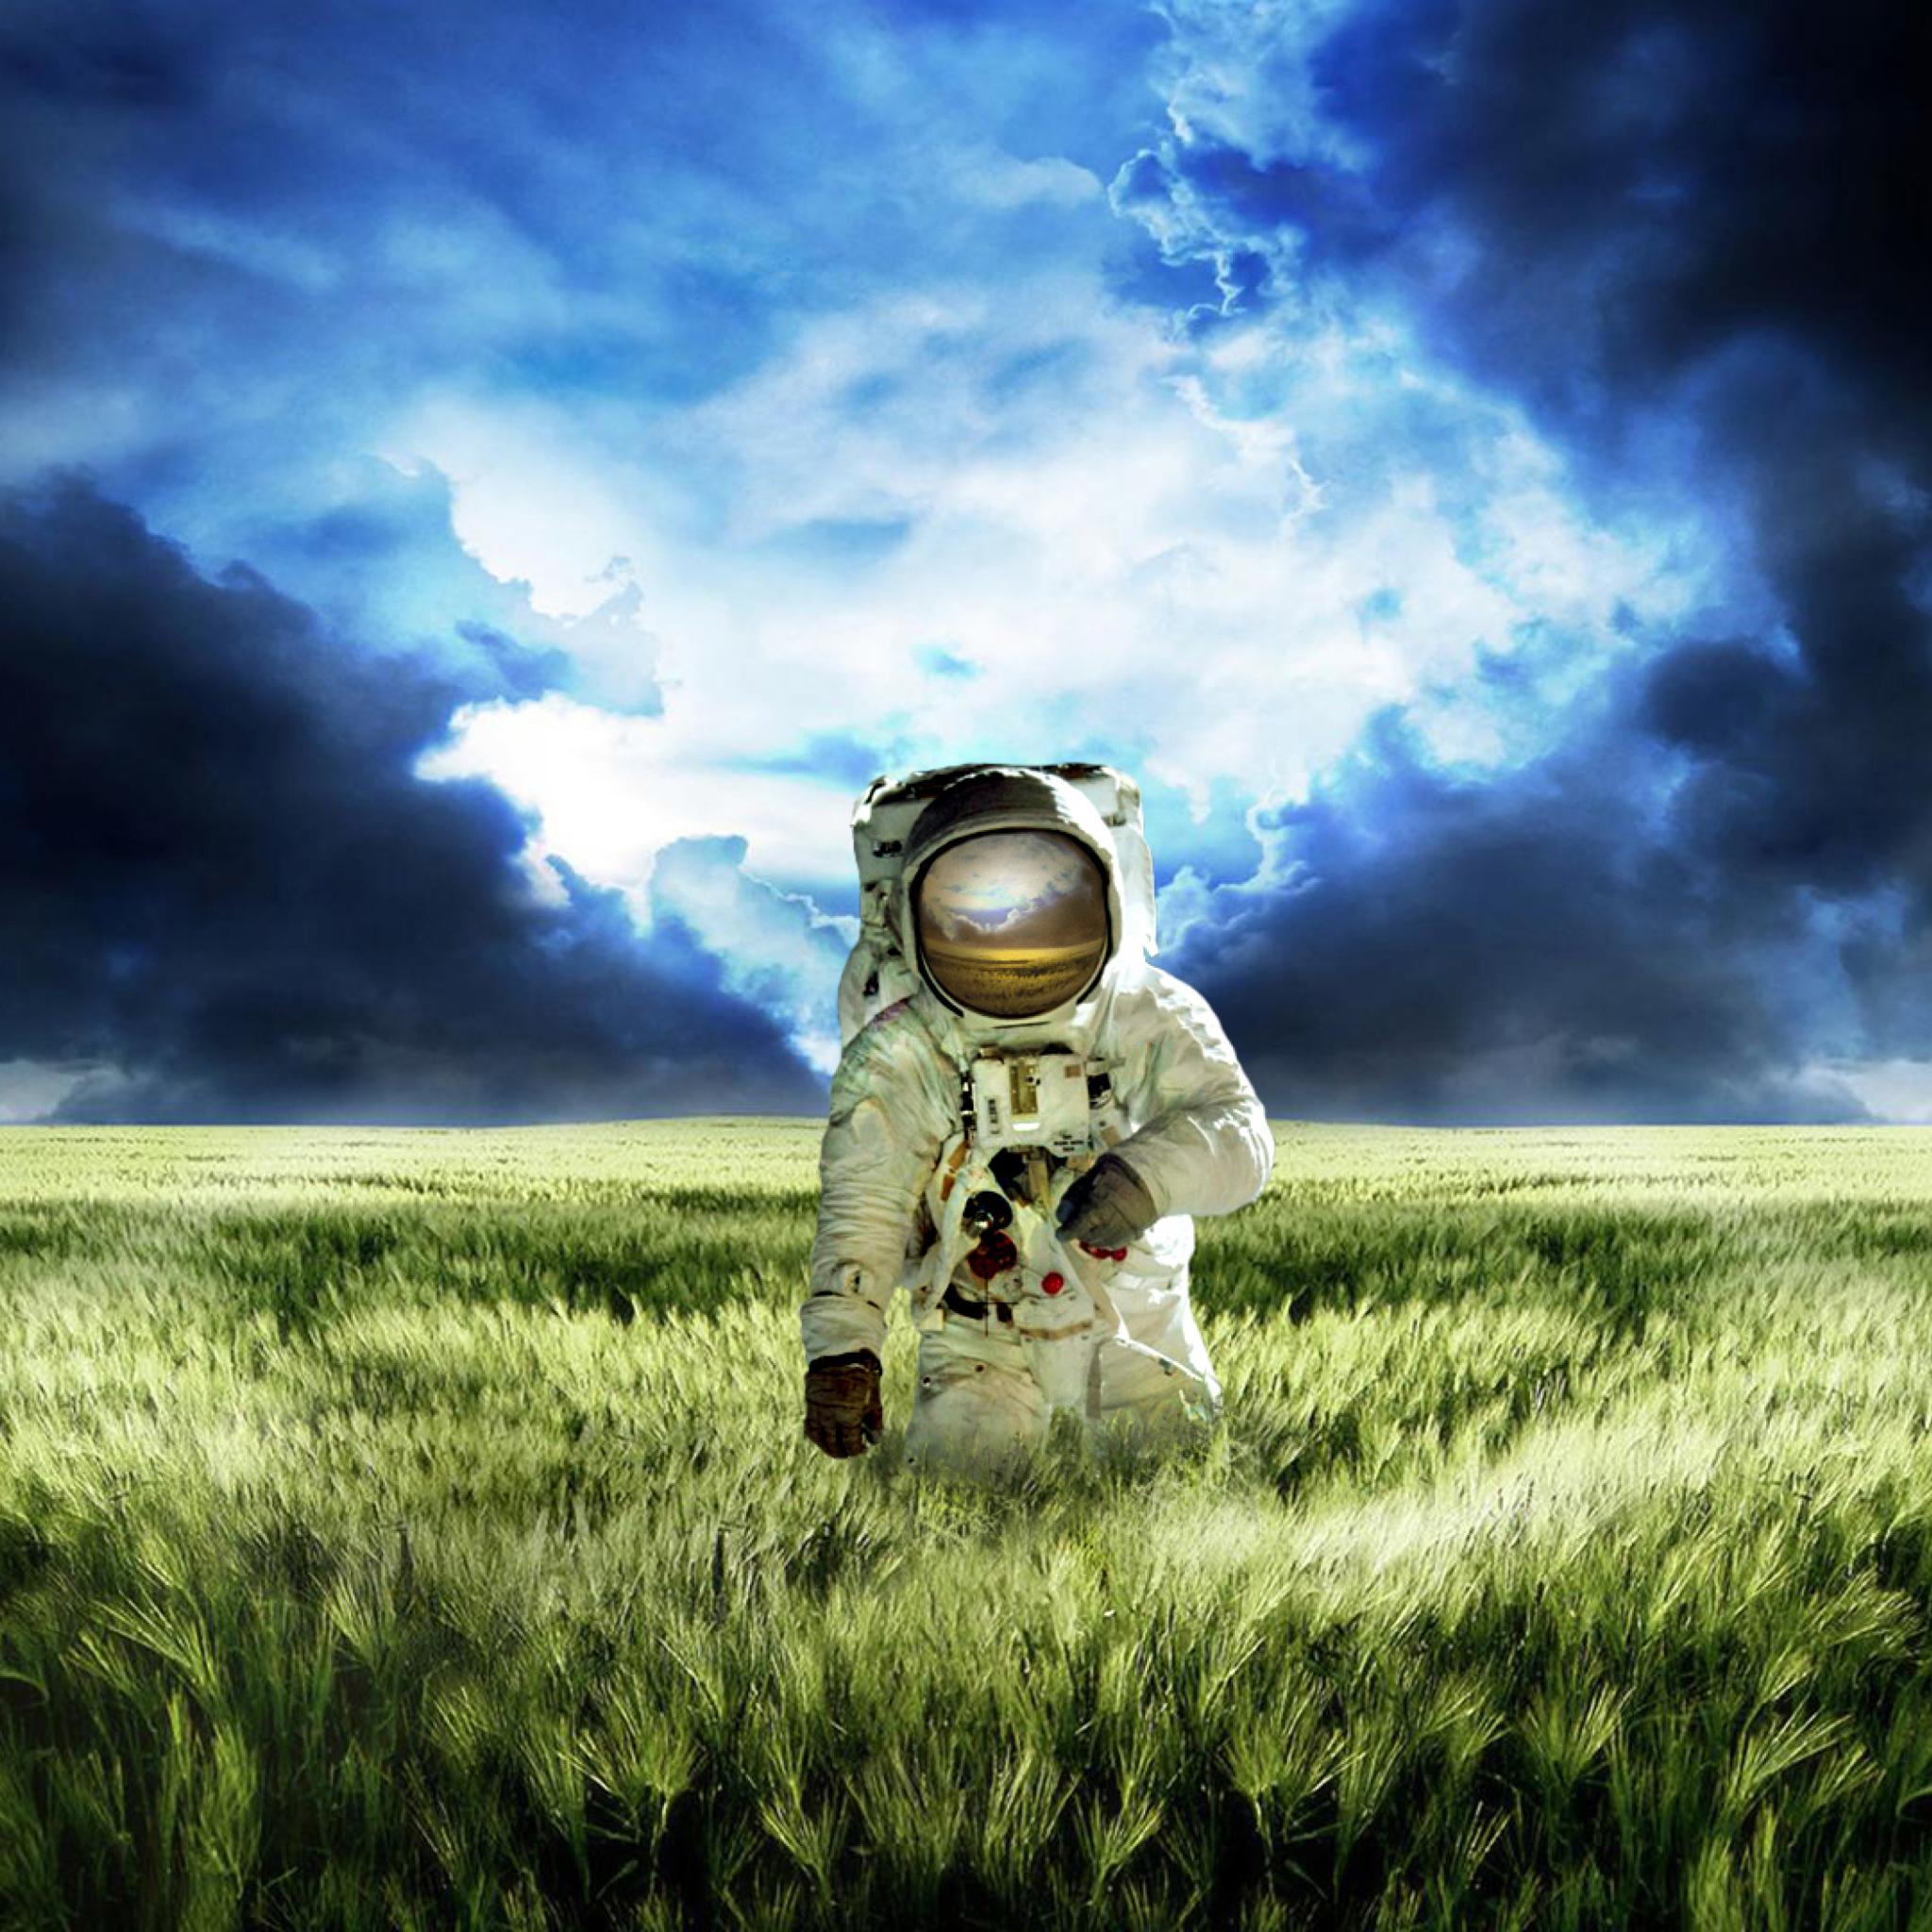 космос трава космонавт space grass astronaut  № 3317071 бесплатно